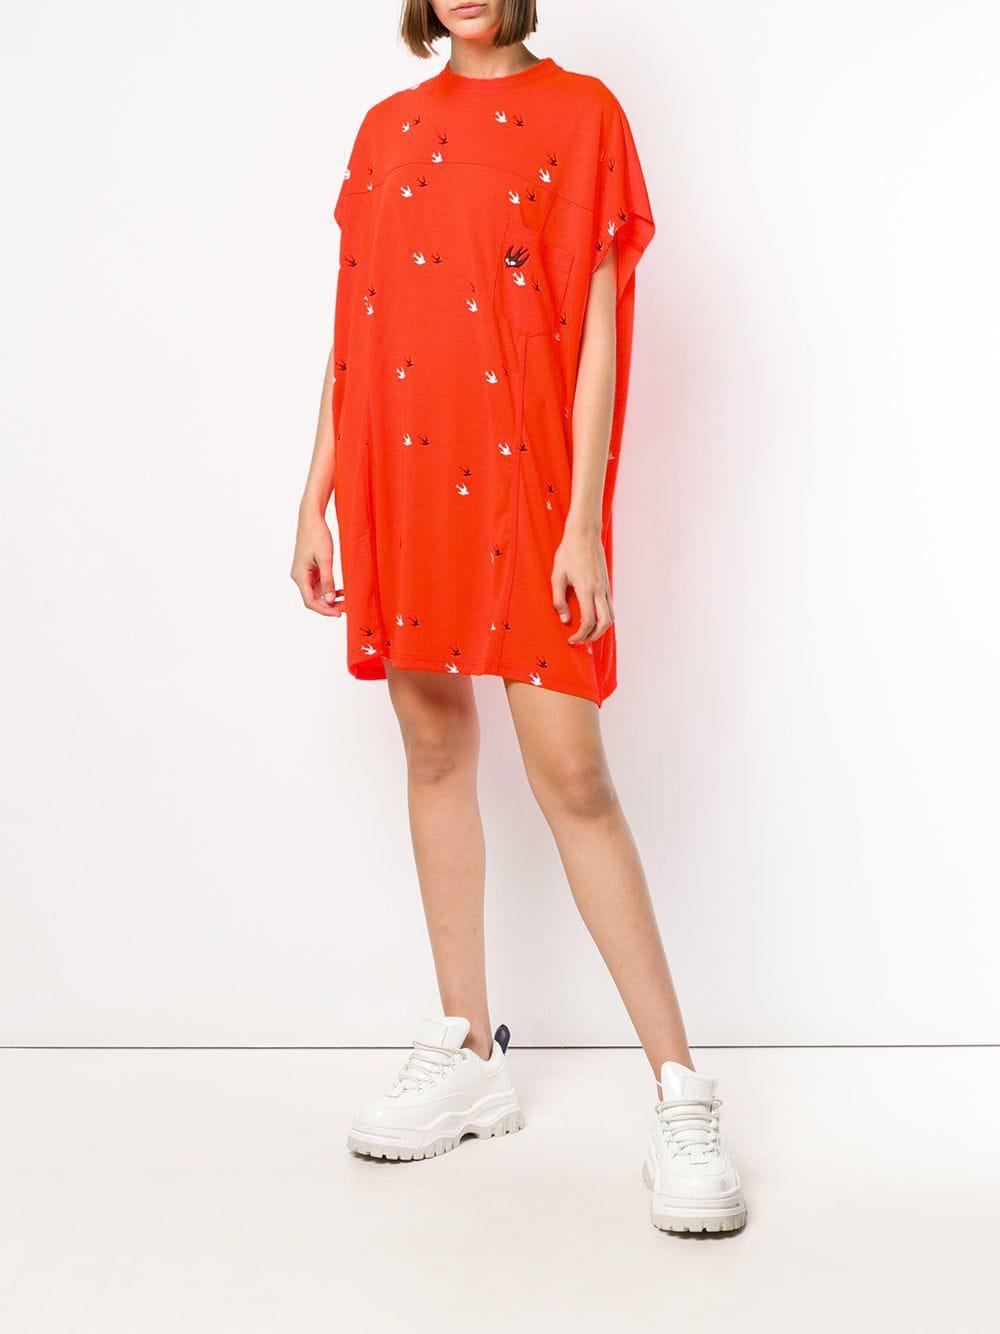 e75c8ad2b01df Lyst - Mcq Alexander Mcqueen Swallows Twins Shift Dress in Orange